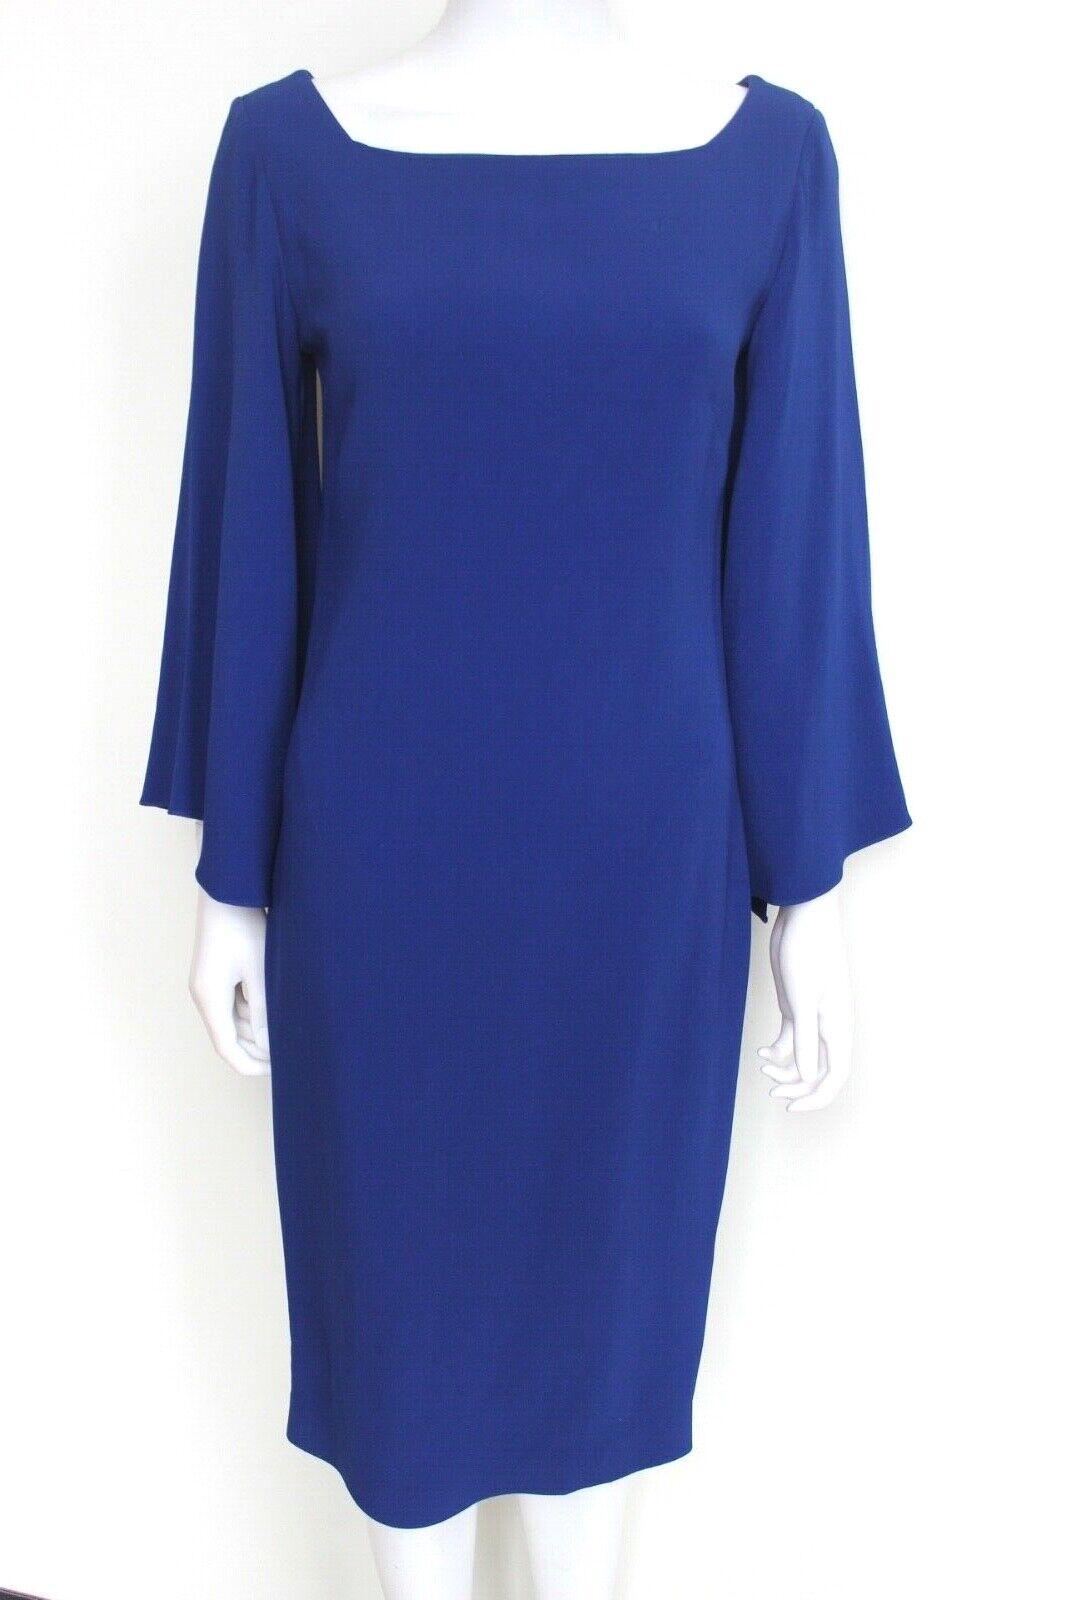 Osman Blau flute long sleeve dress